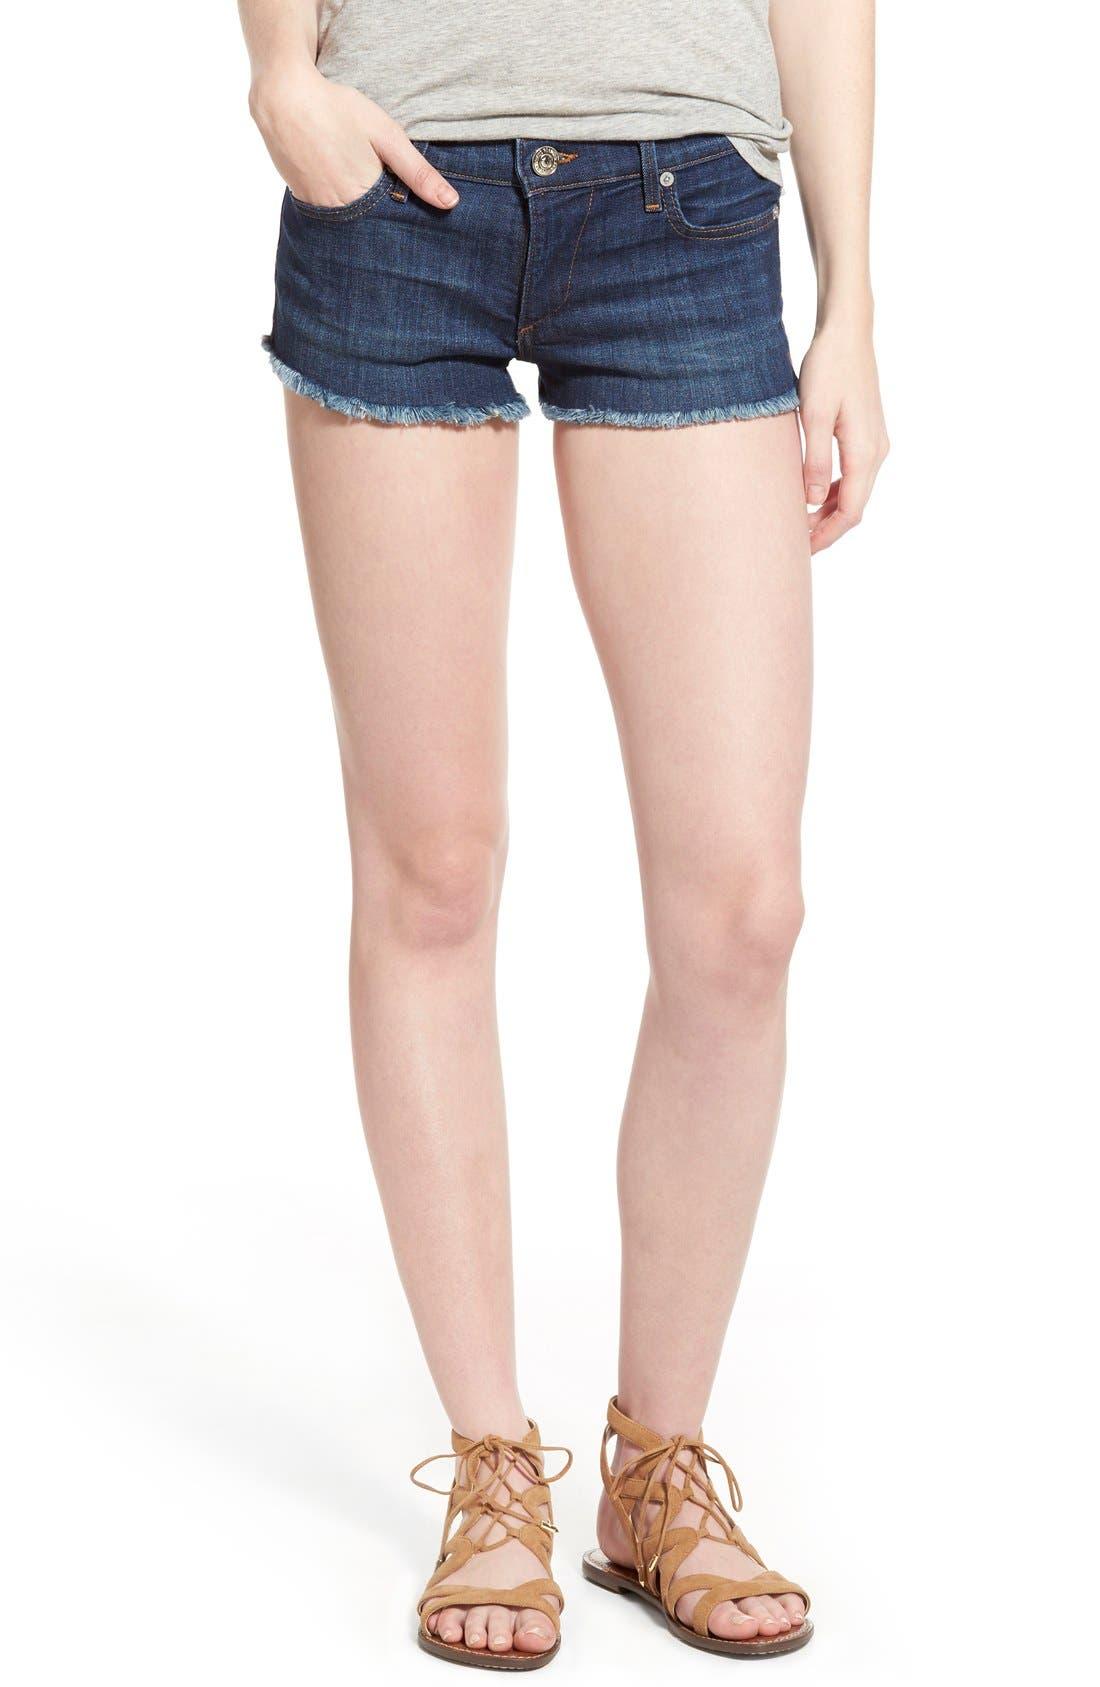 True Religion Brand Jeans Joey Flap Pocket Cutoff Denim Shorts (Worn Vintage)